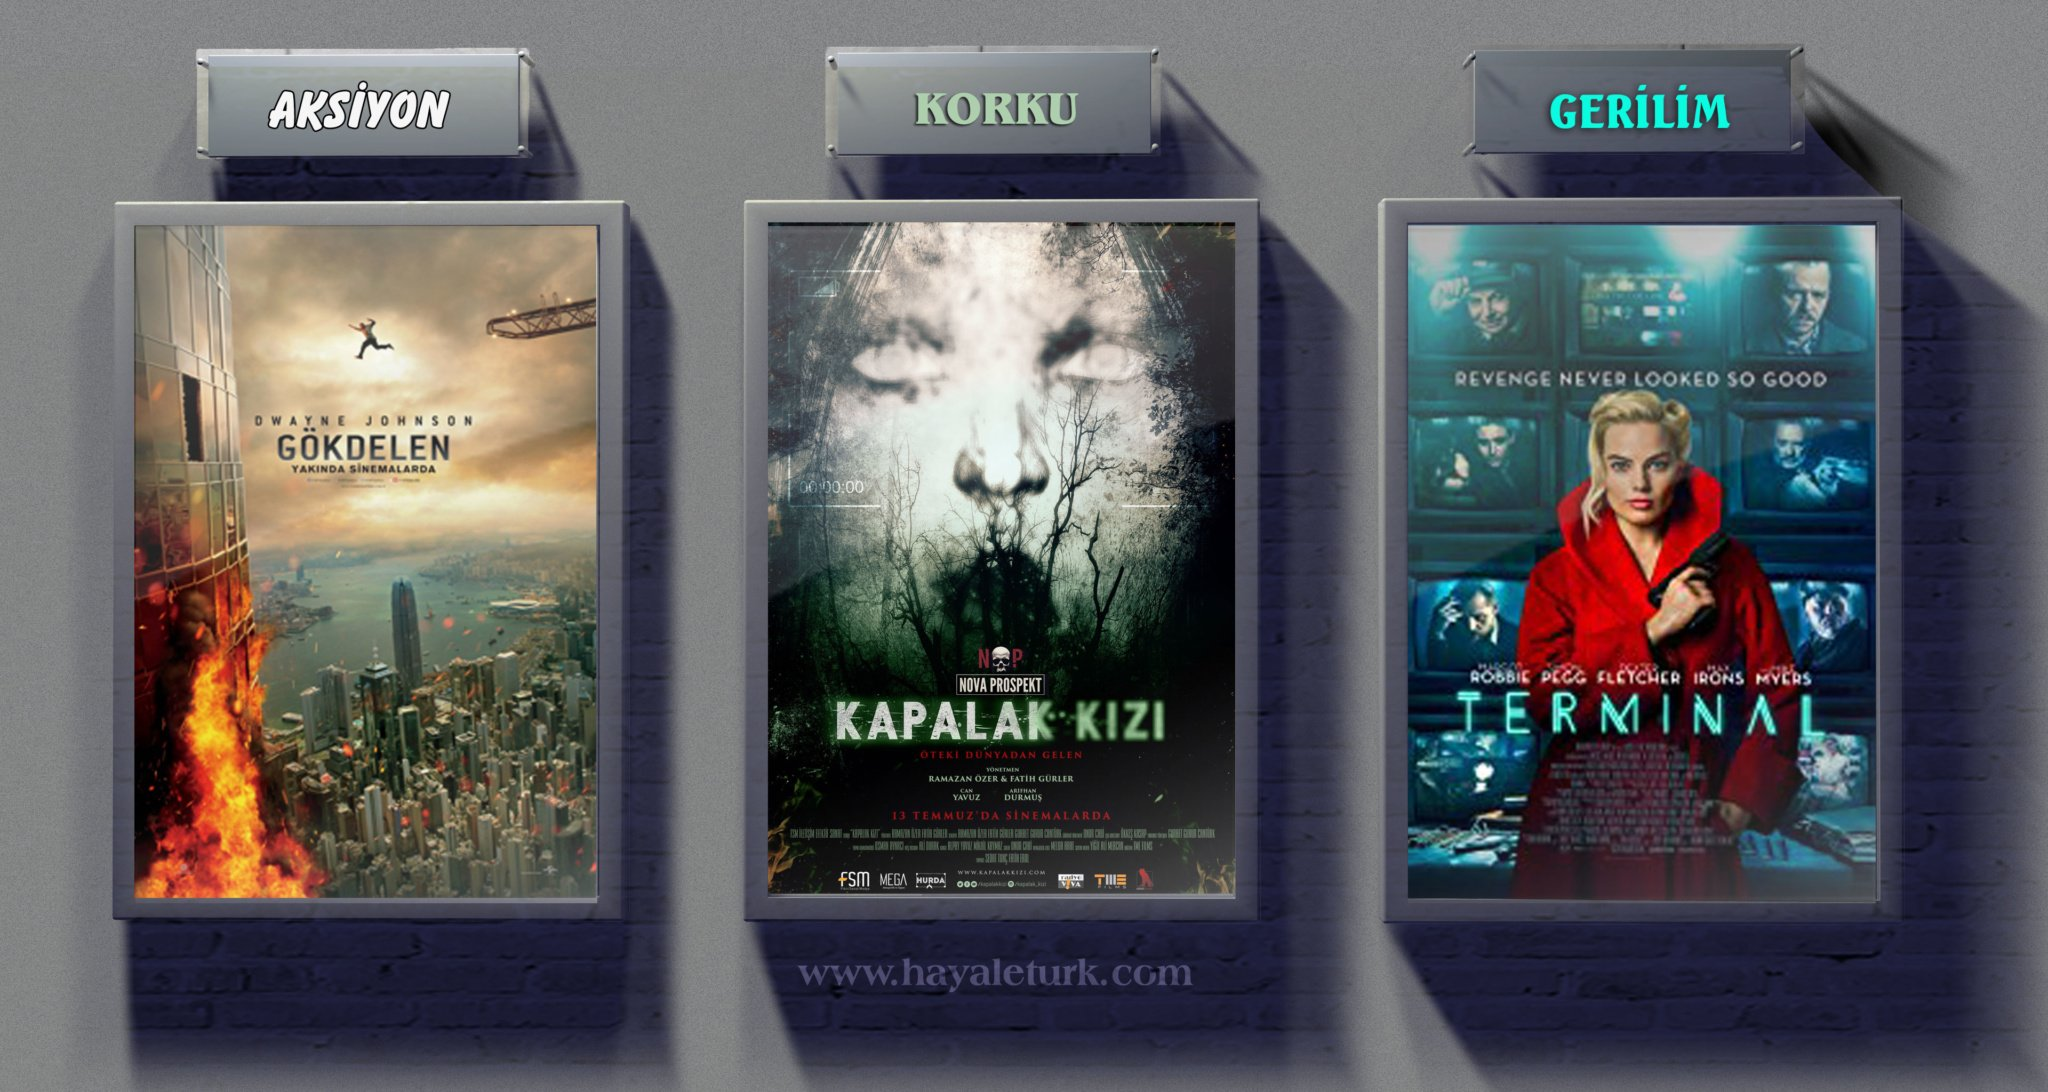 Sinemalarda bu hafta 9 Film vizyonda 13-20 Temmuz 2018